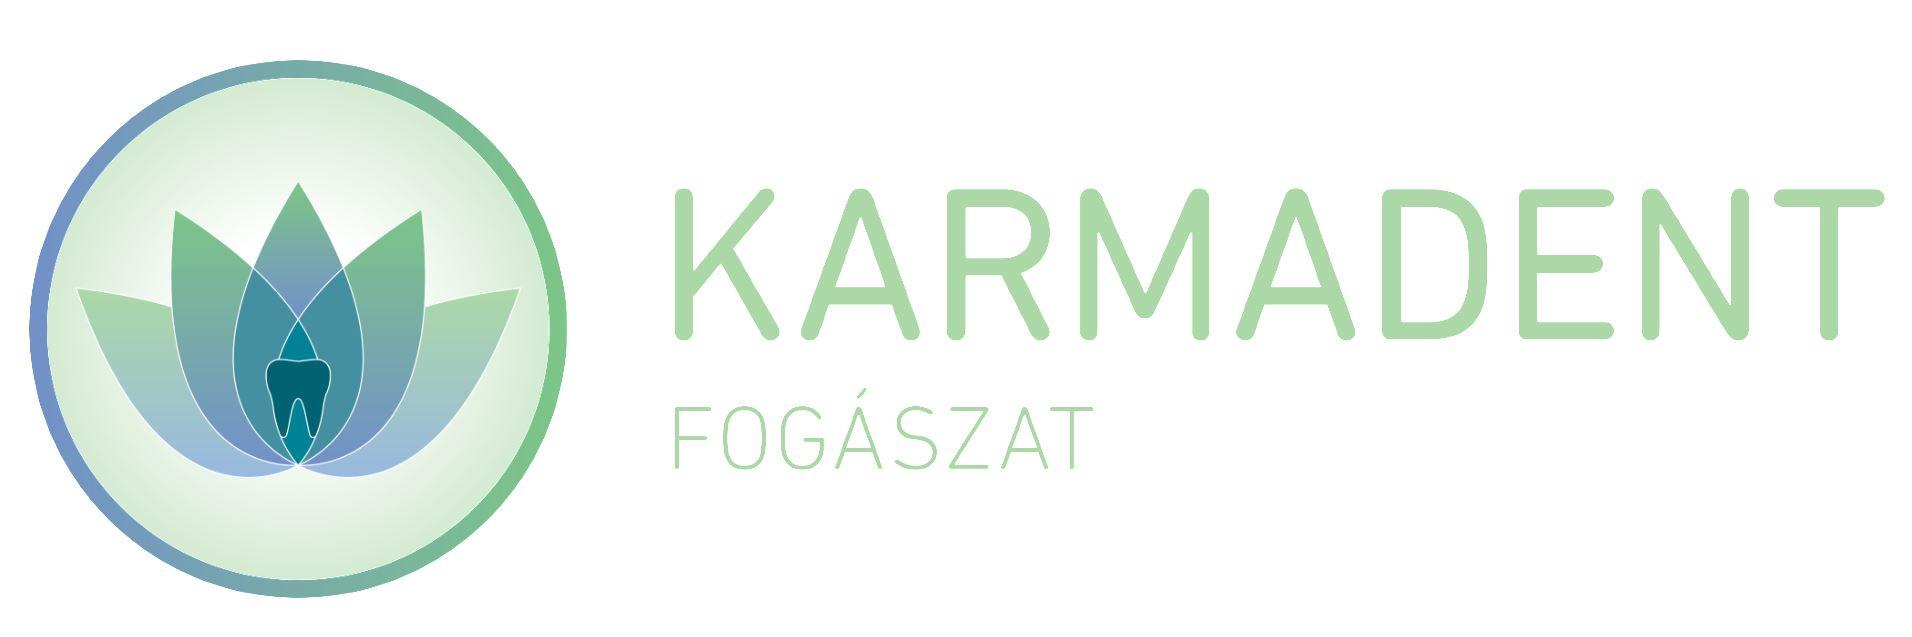 Karmadent Fogorvos Budapest